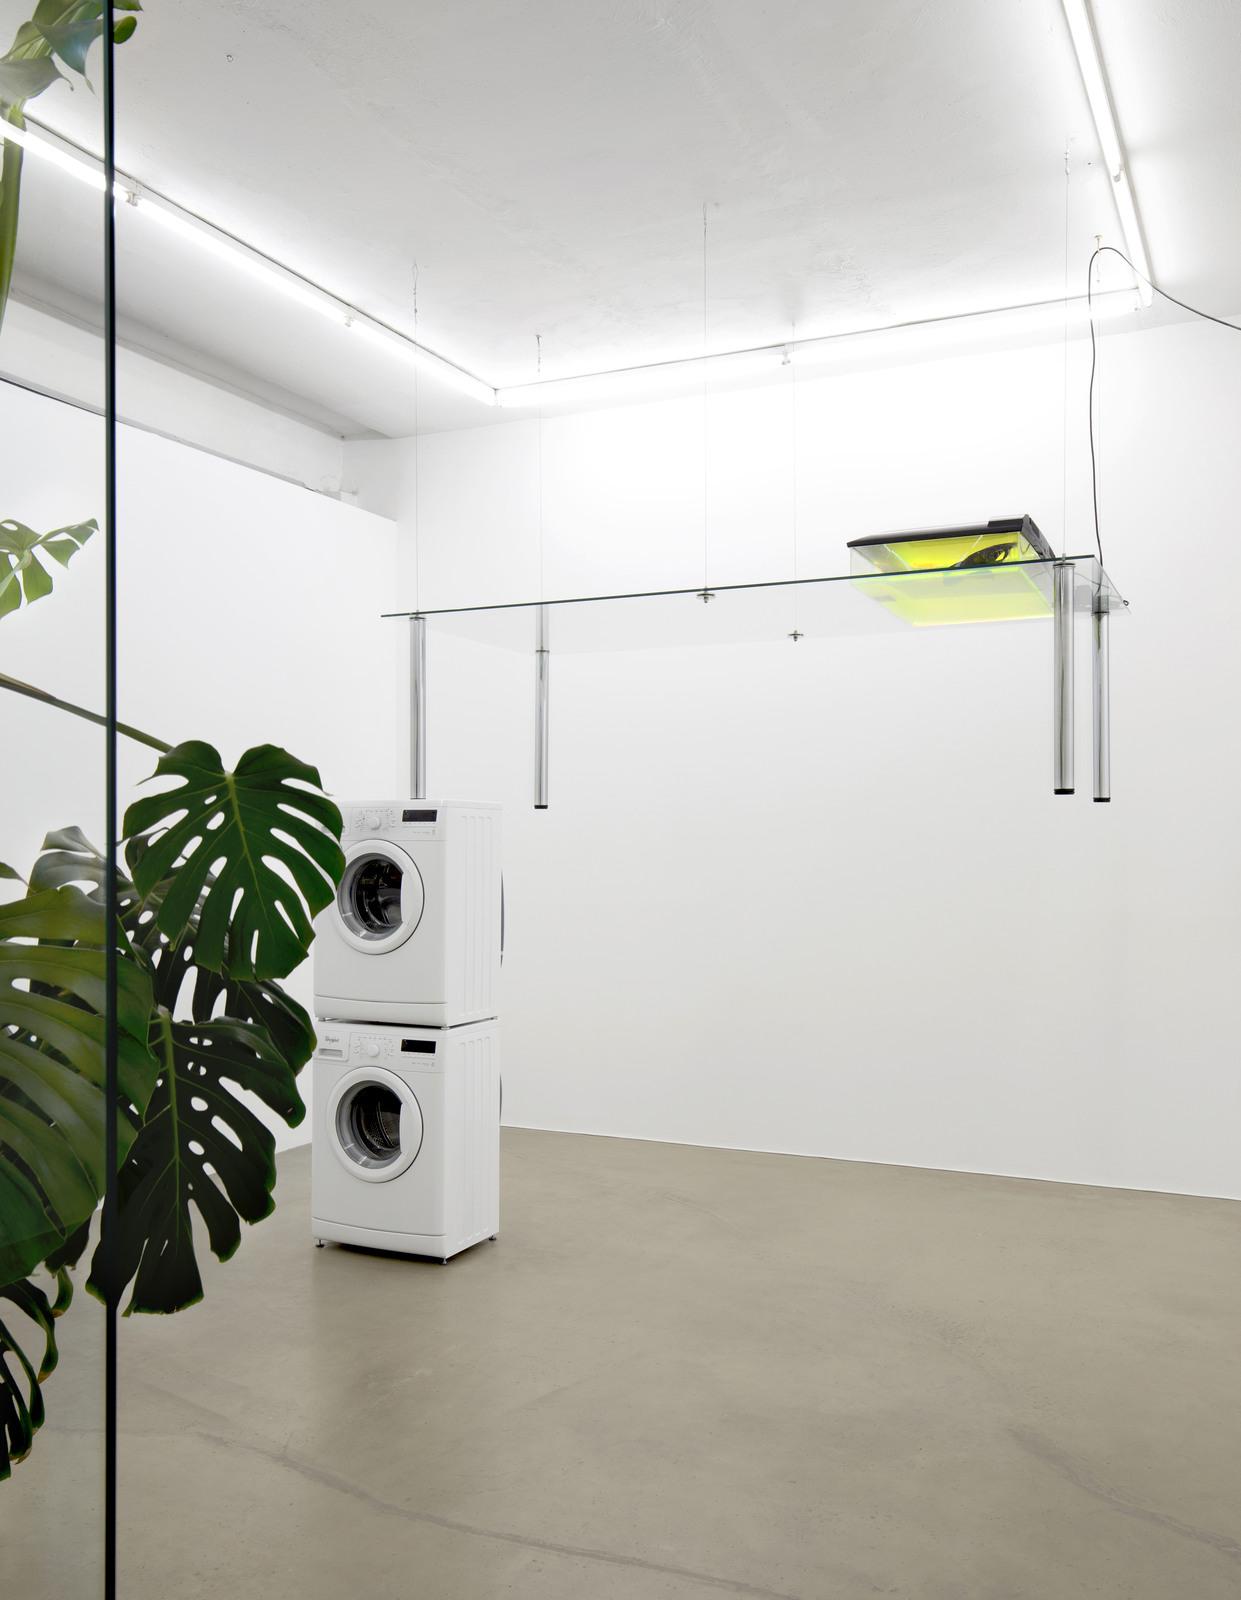 17. Pepo Salazar_exhibition view